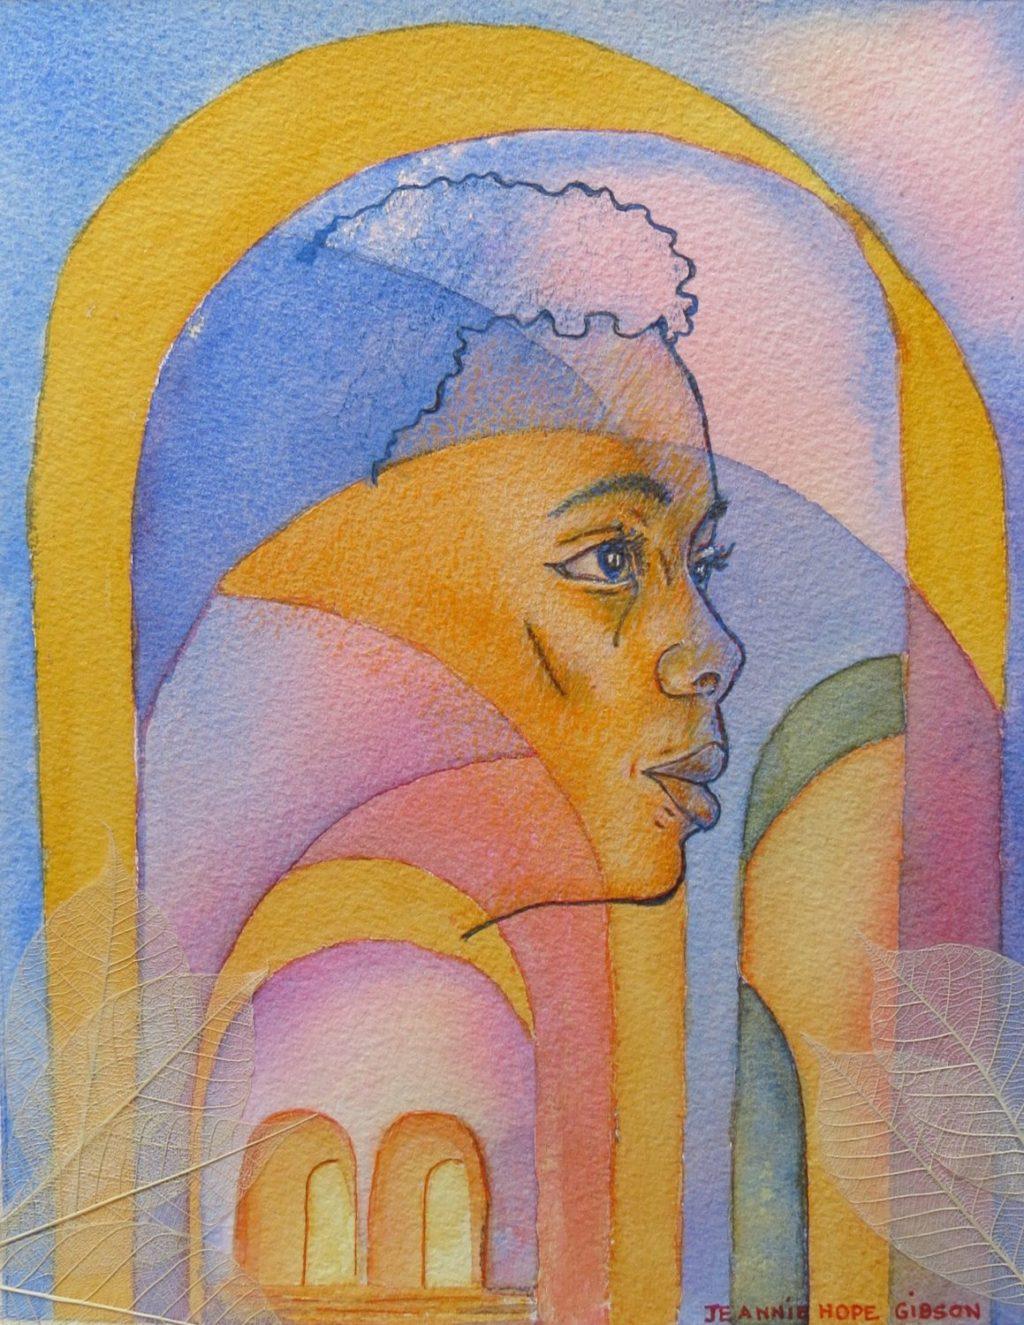 Sunrise by Jeannie Hope Gibson